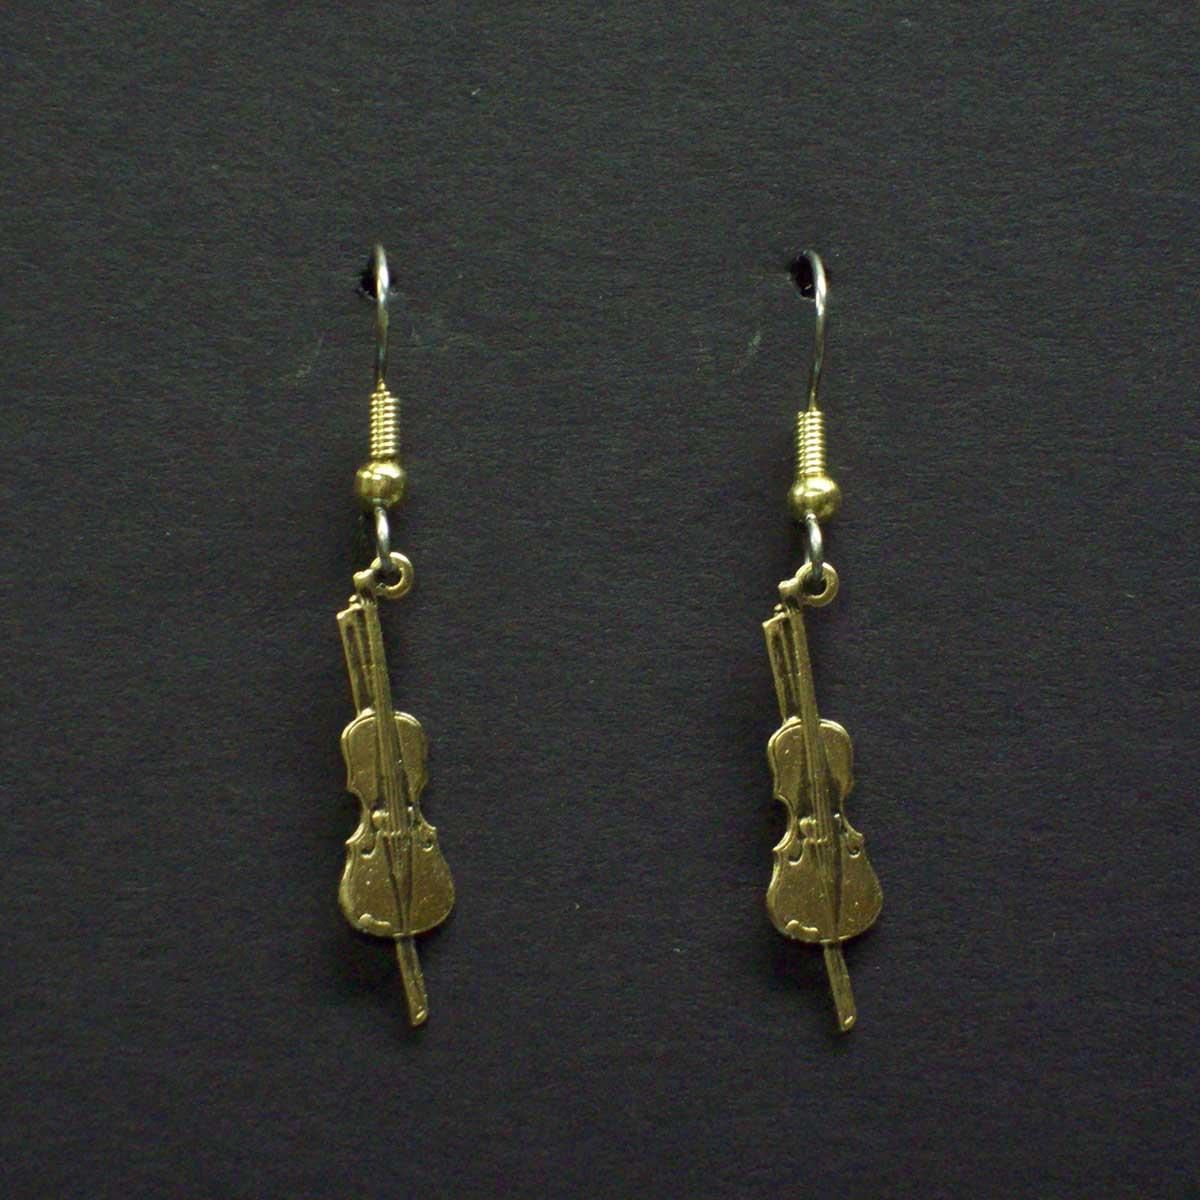 Small Dangle Violin Earrings